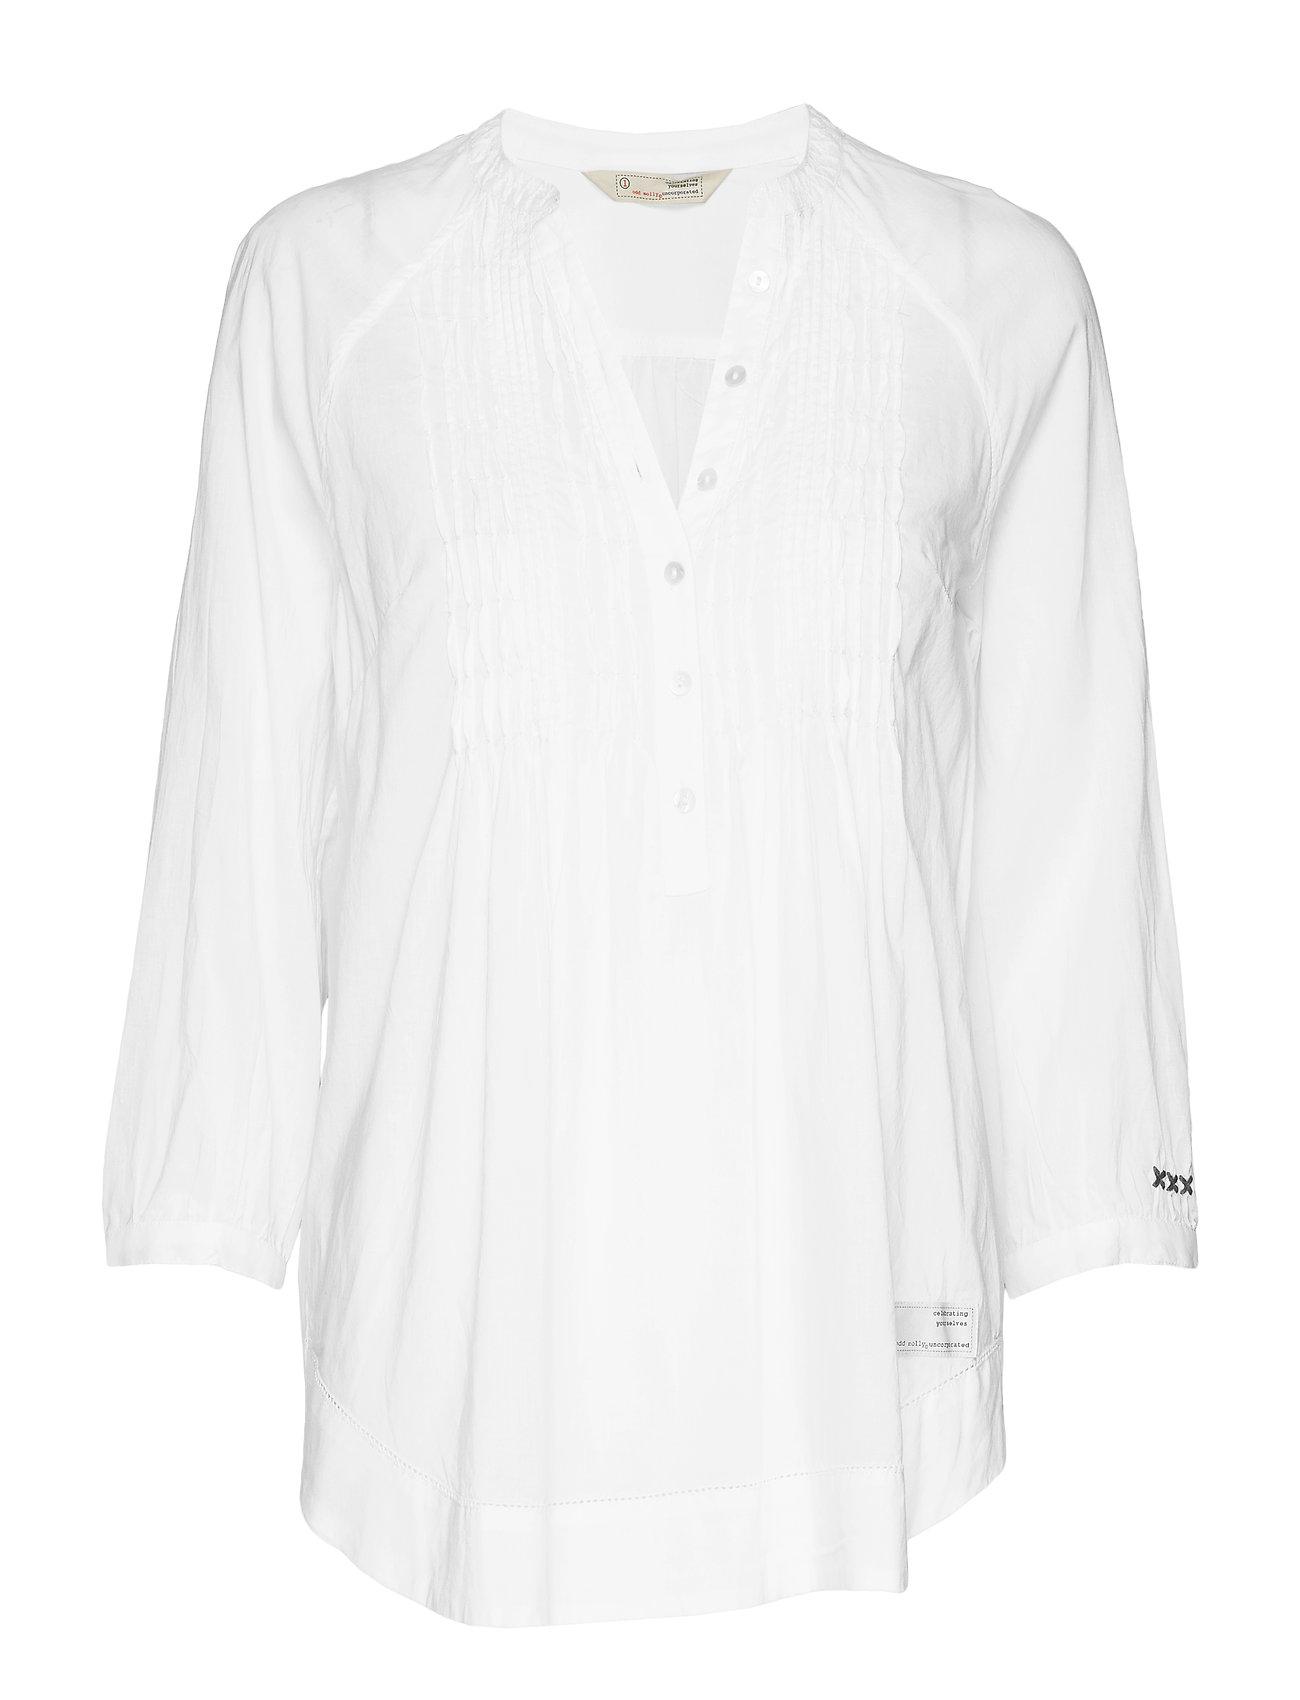 ODD MOLLY embrace me blouse - BRIGHT WHITE